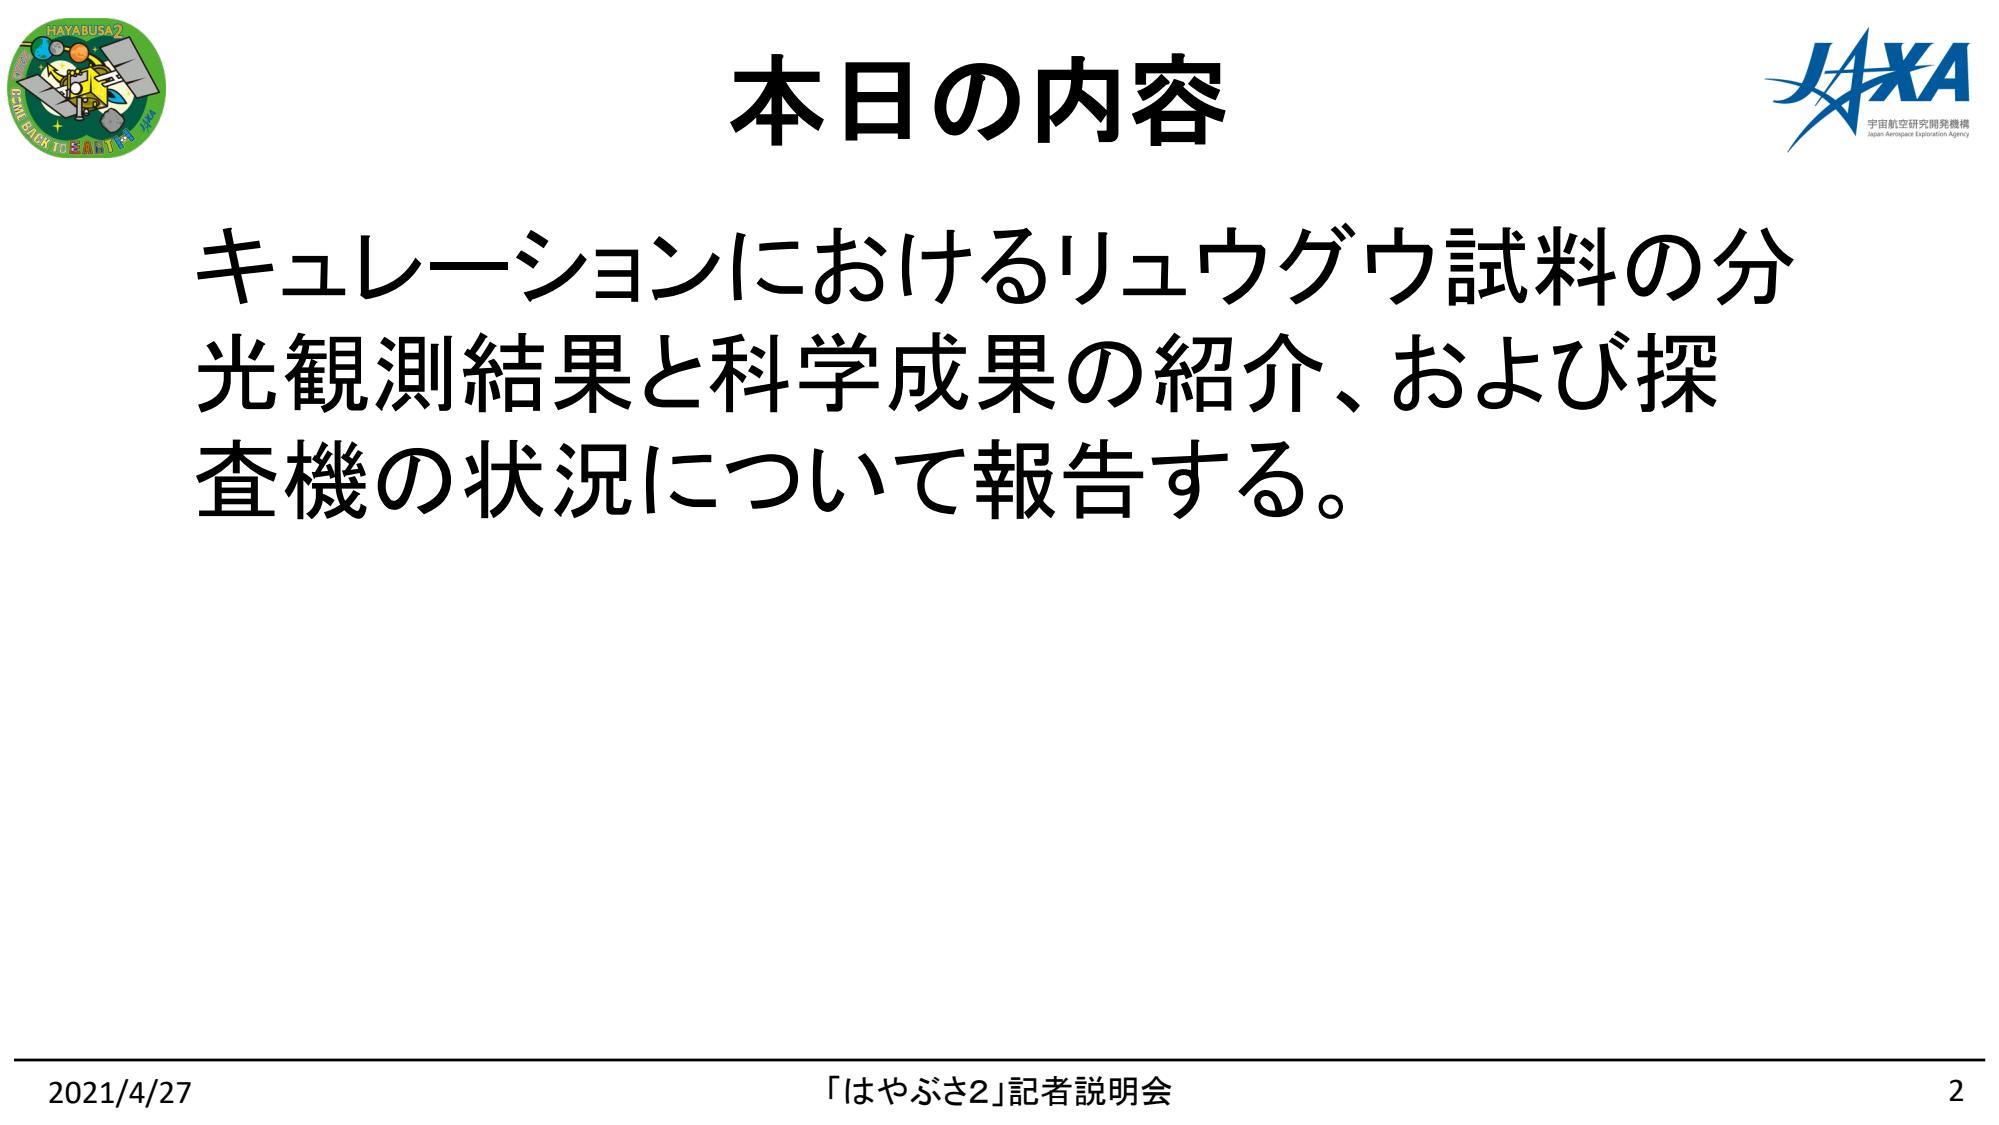 f:id:Imamura:20210427135056p:plain